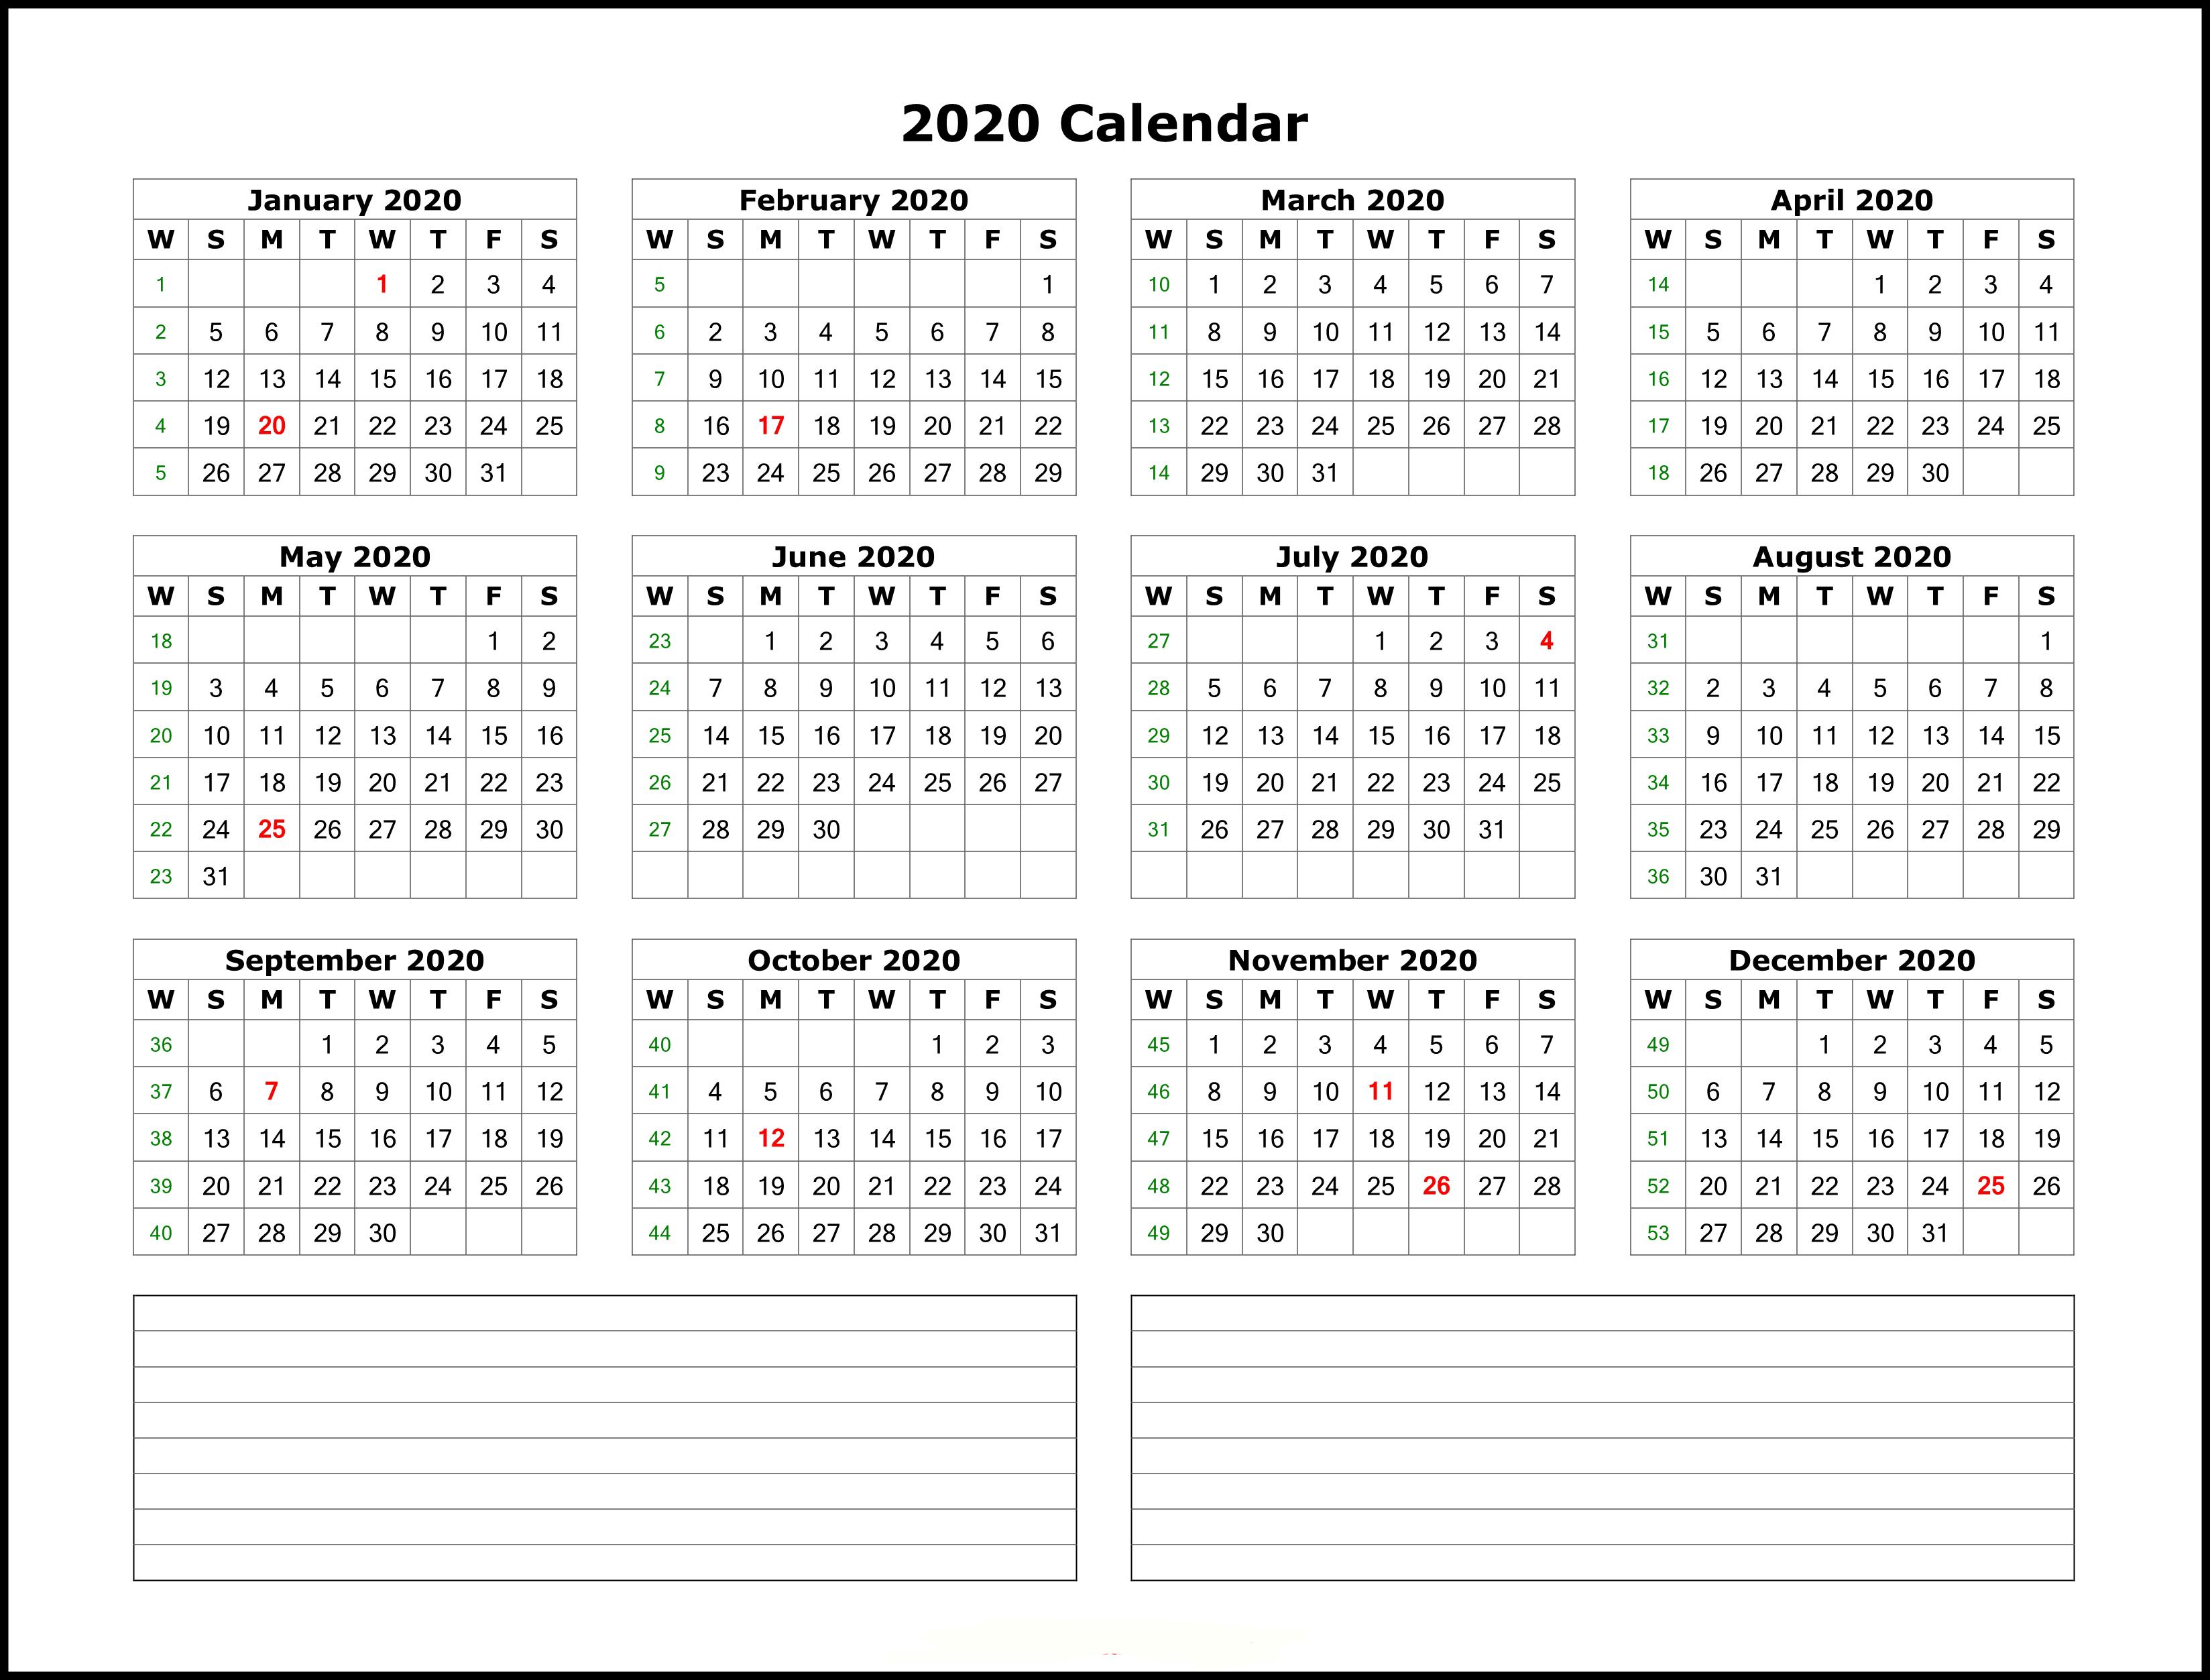 Free 2020 Excel Calendar - Wpa.wpart.co